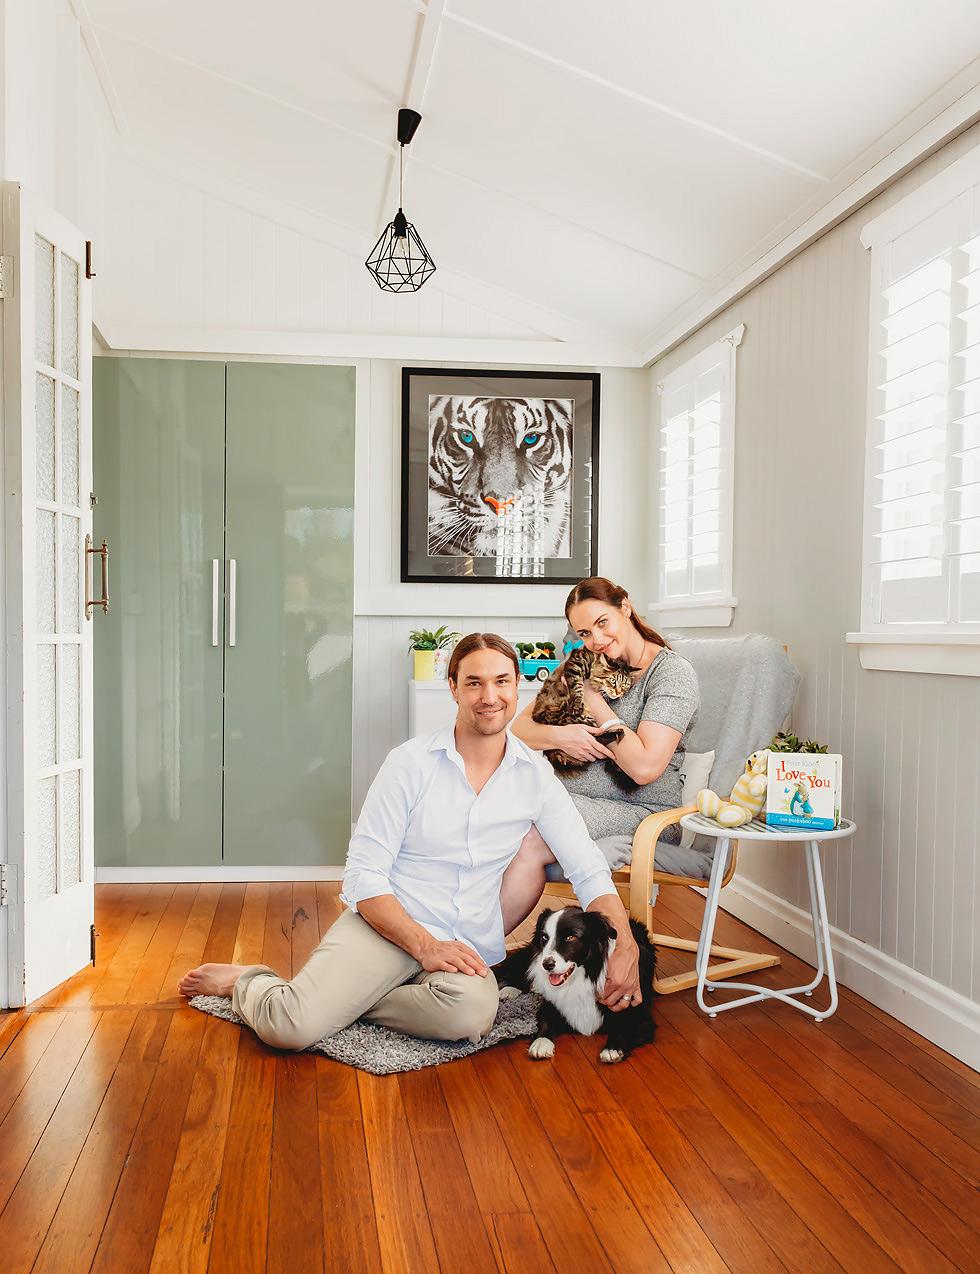 Maternity photography Brisbane